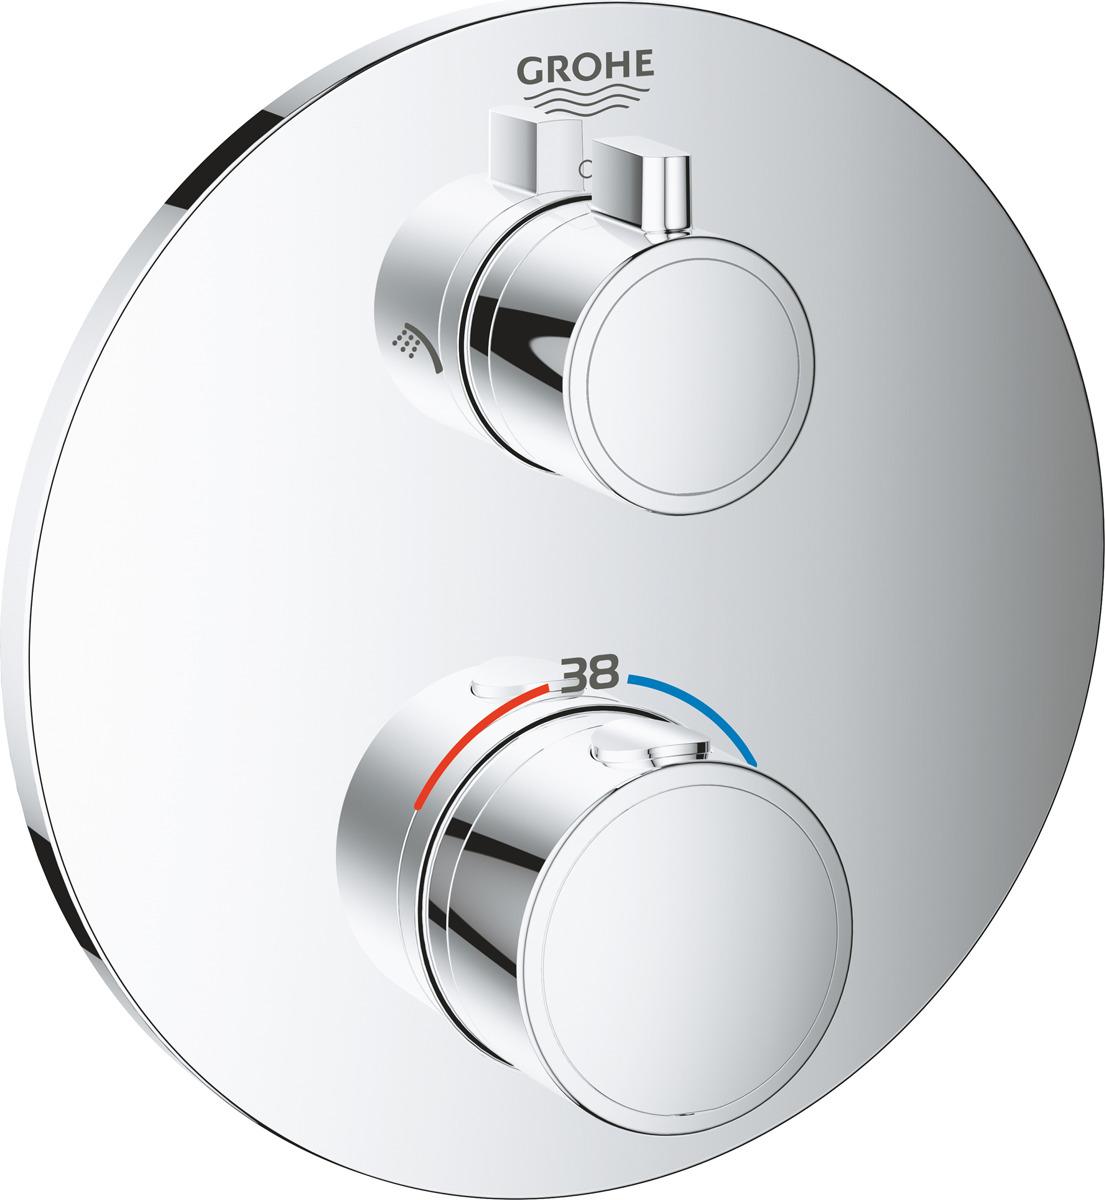 Термостат для душа Grohe Grohtherm, 24076000, с переключателем, серебристый